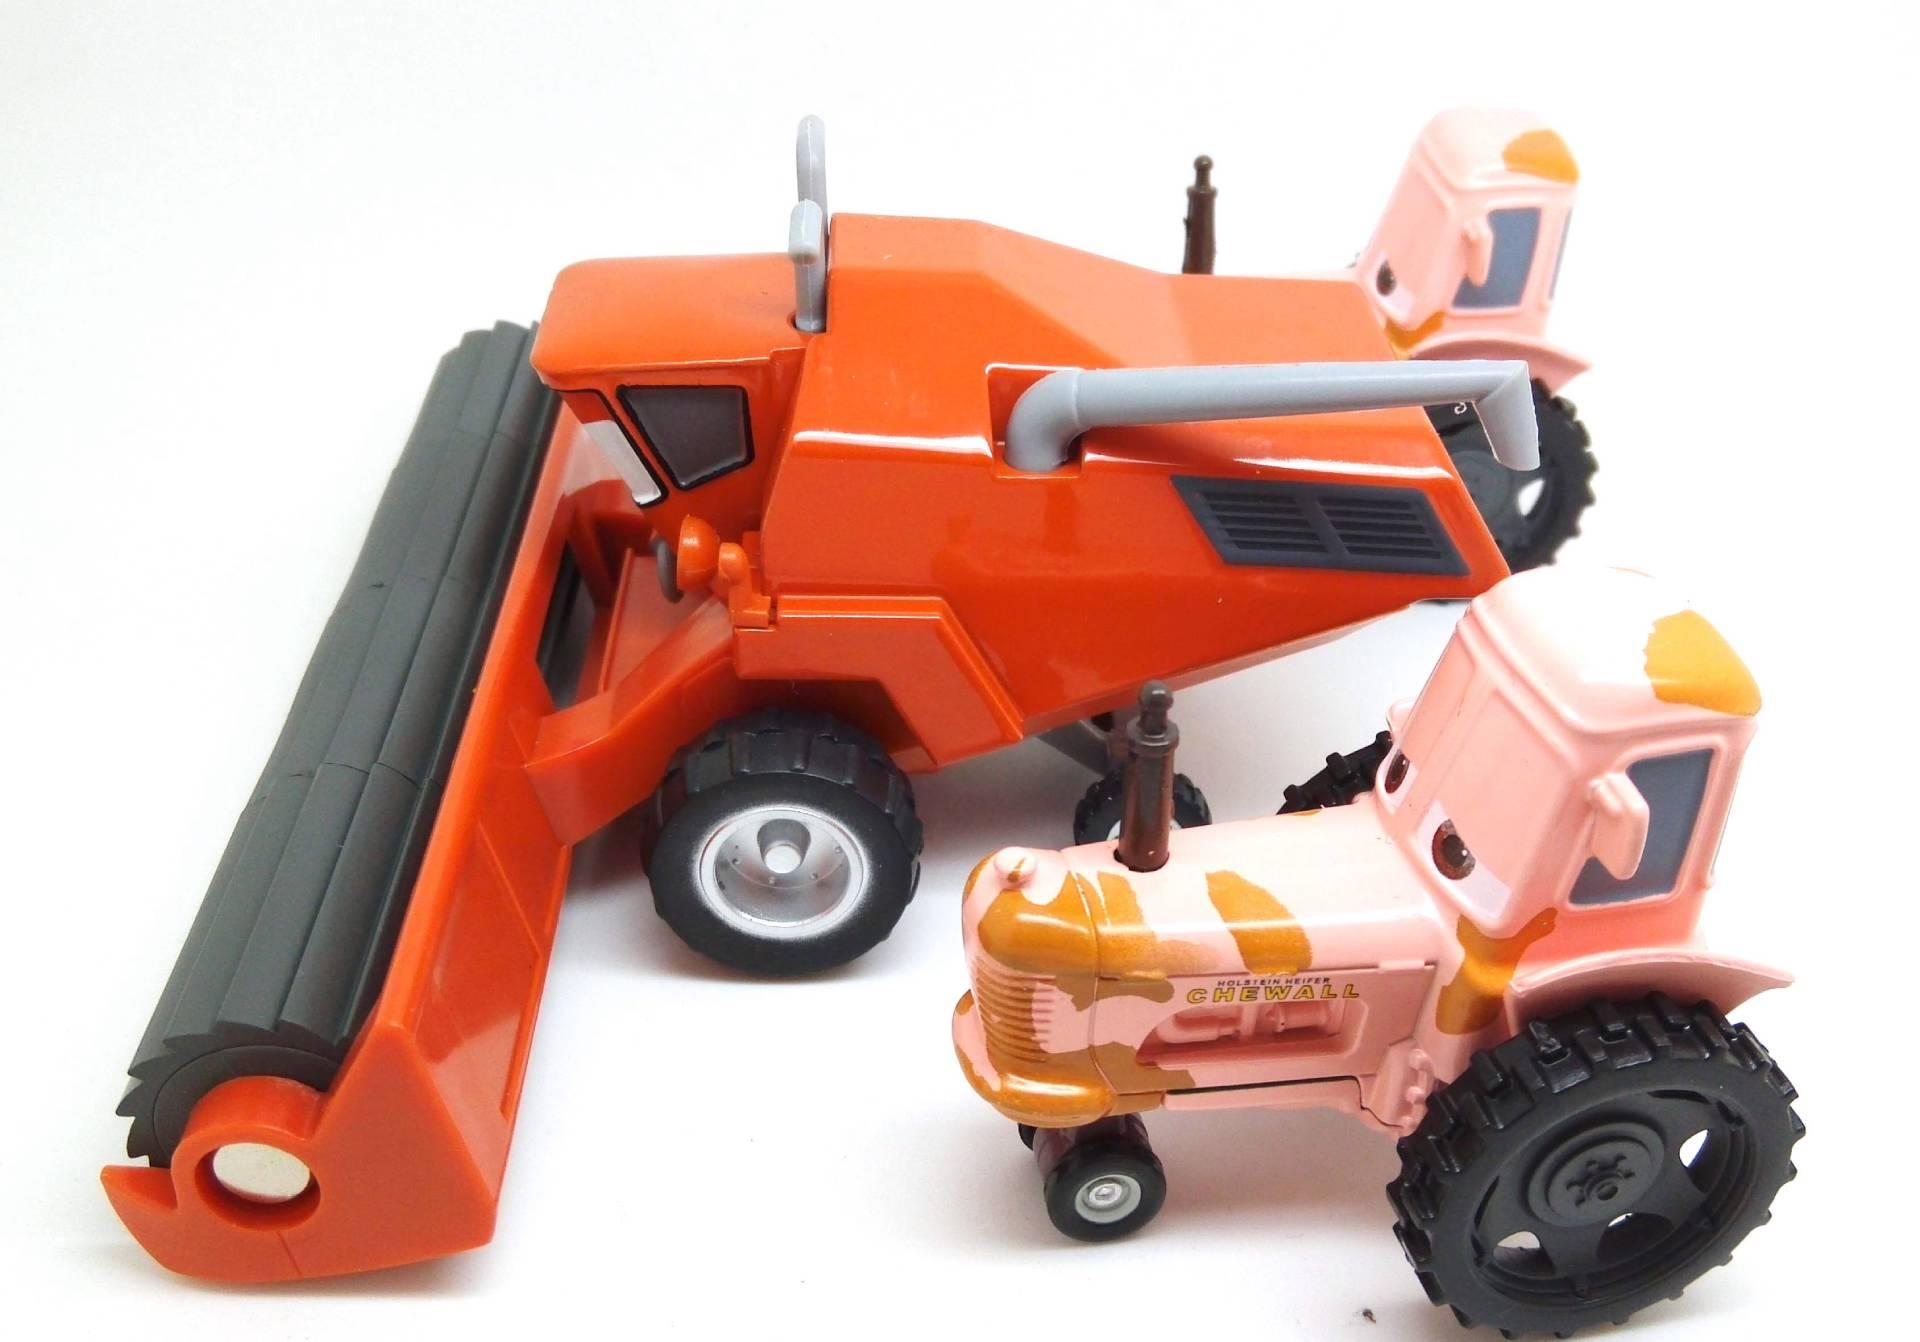 Disney Cars Diecast: 1:55 Disney Pixar Cars Diecast-Frank With 2 TIPPIN TRACTOR